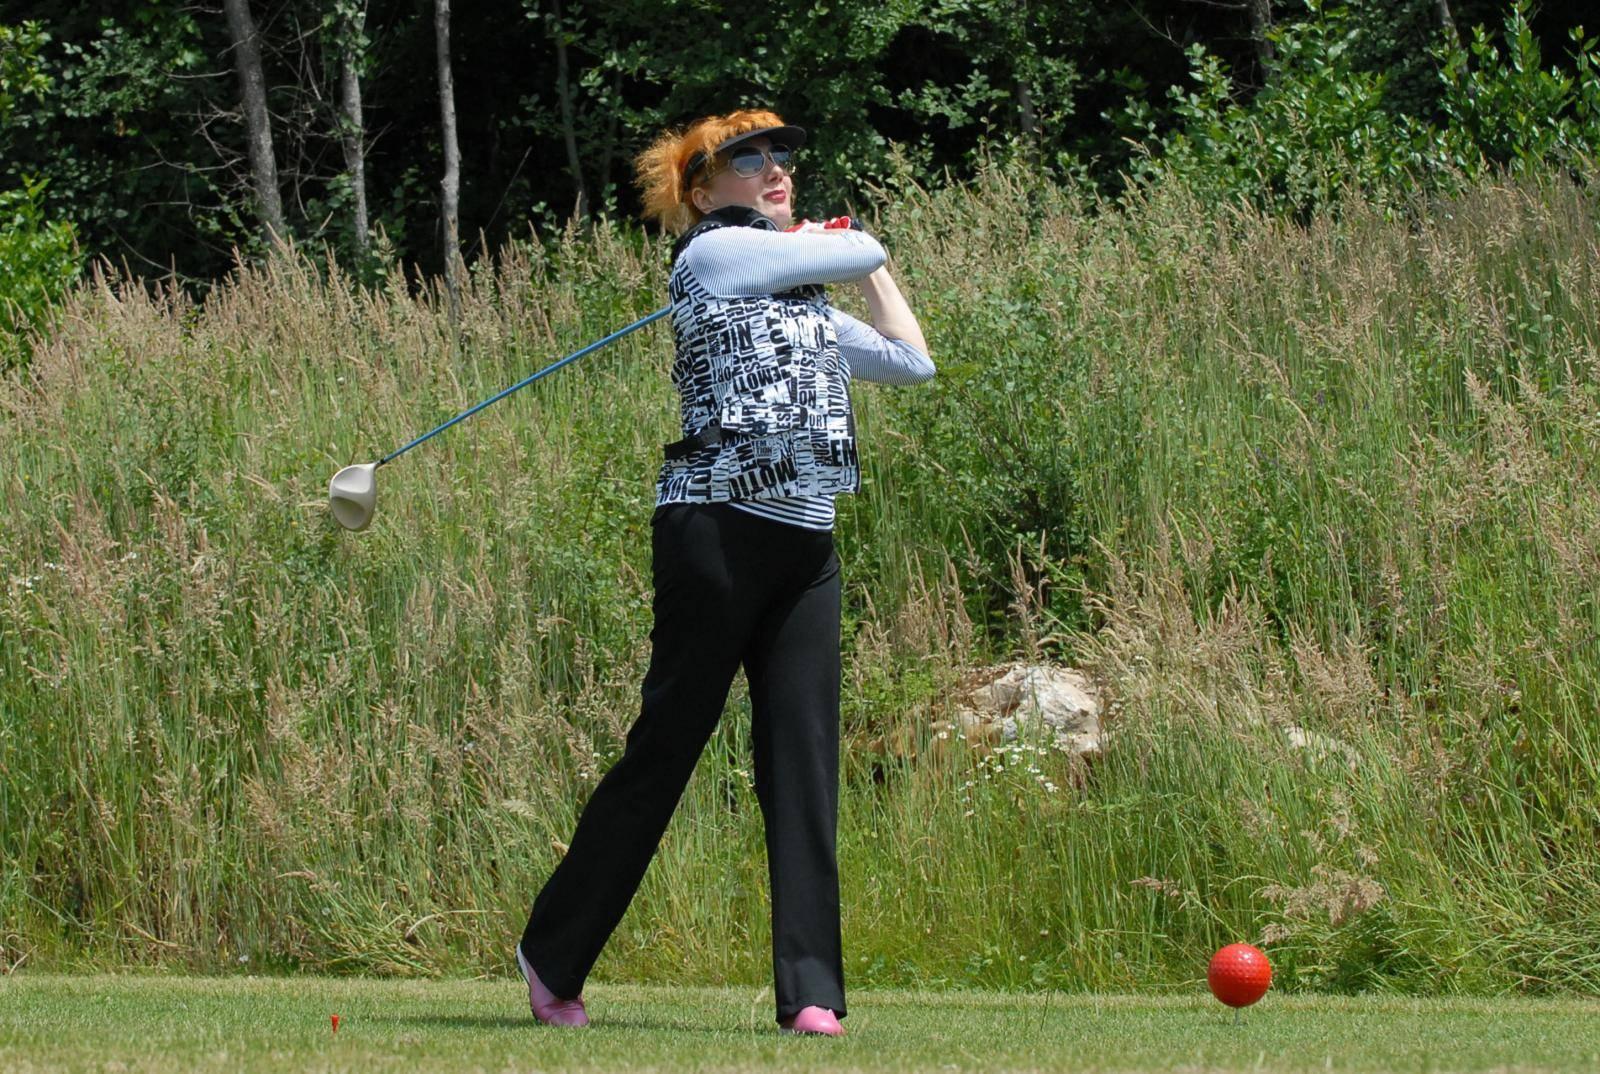 Golf-UNICEF